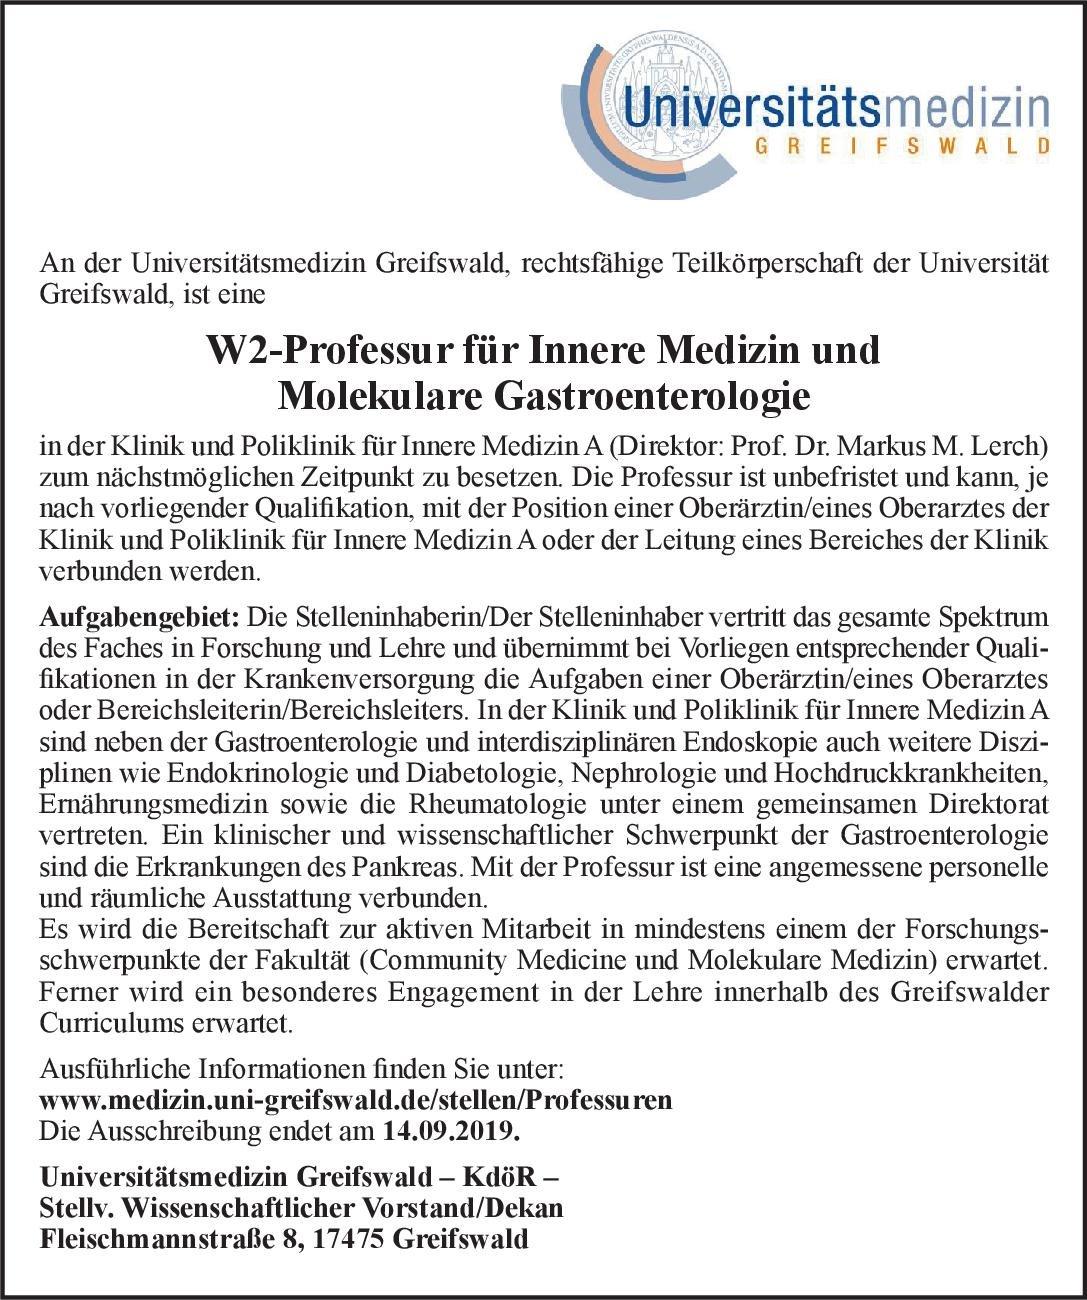 Universitätsmedizin Greifswald – KdöR – W2-Professur für Innere Medizin und Molekulare Gastroenterologie  Innere Medizin und Gastroenterologie, Innere Medizin Professor